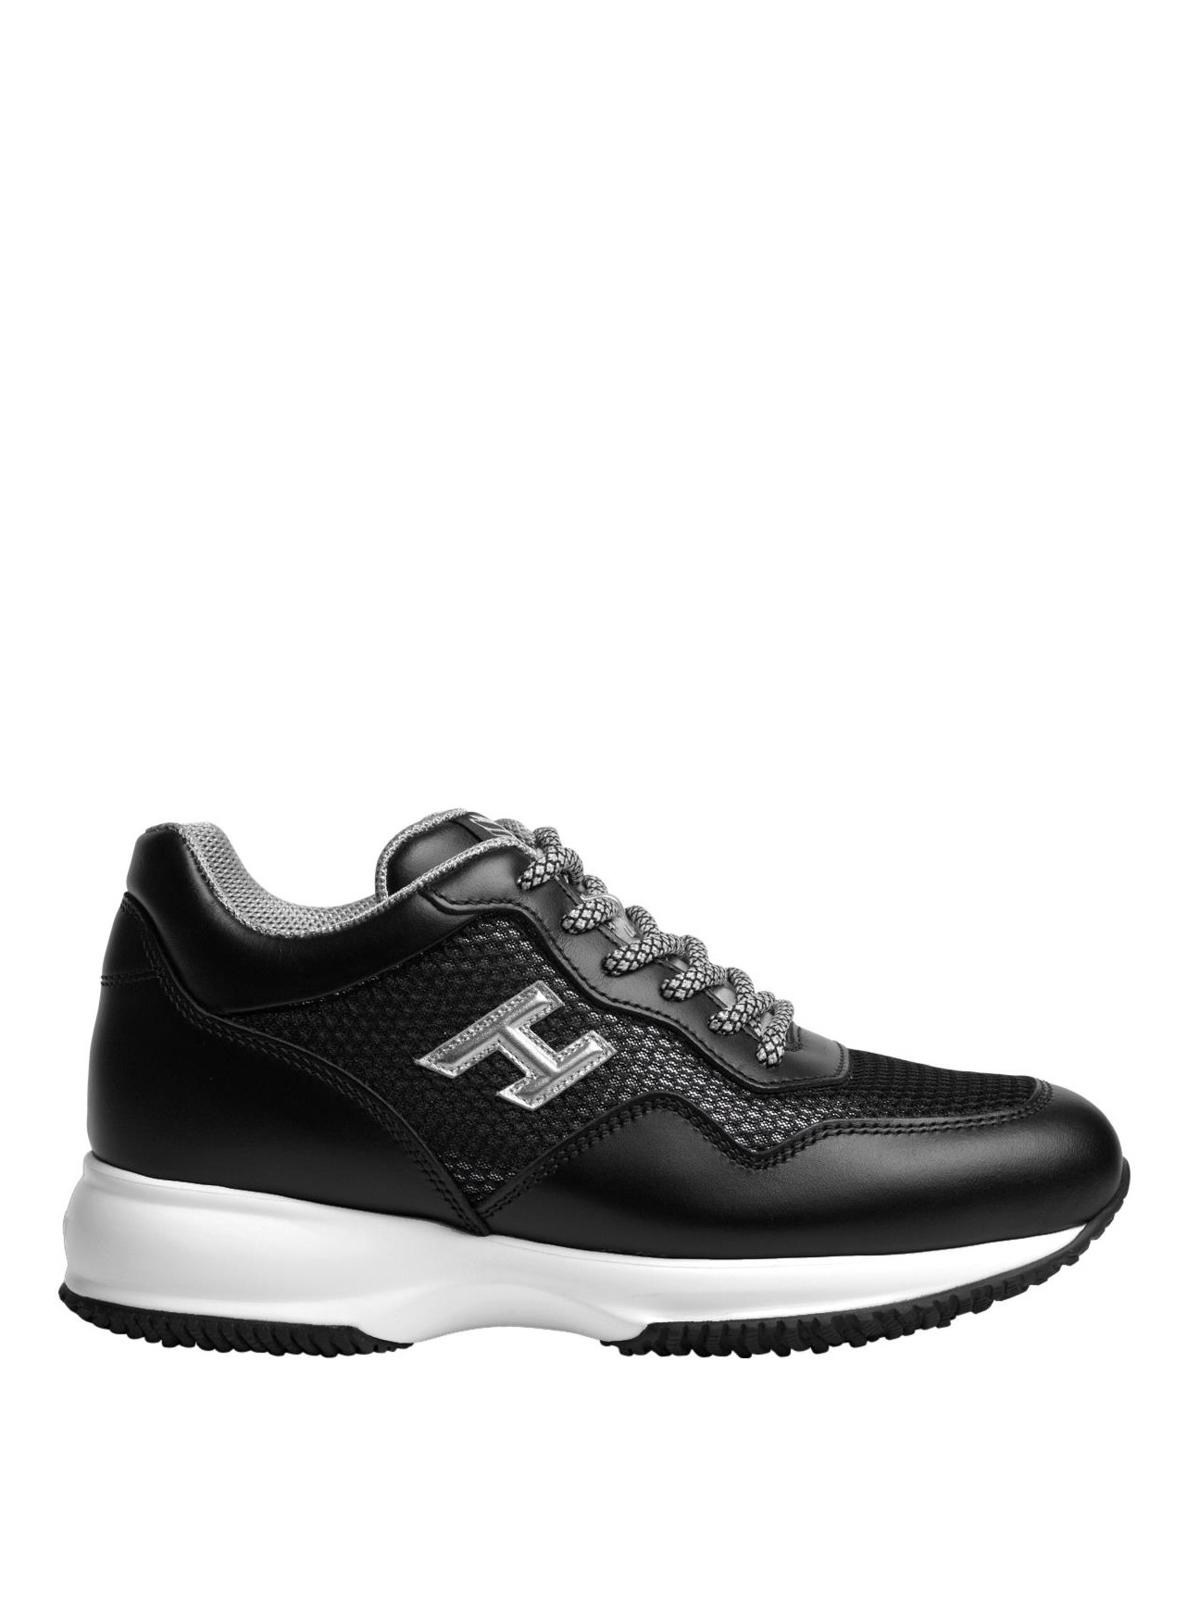 Sneakers Hogan - Sneaker Interactive nere estive - HXW00N0W661IGA0QBM